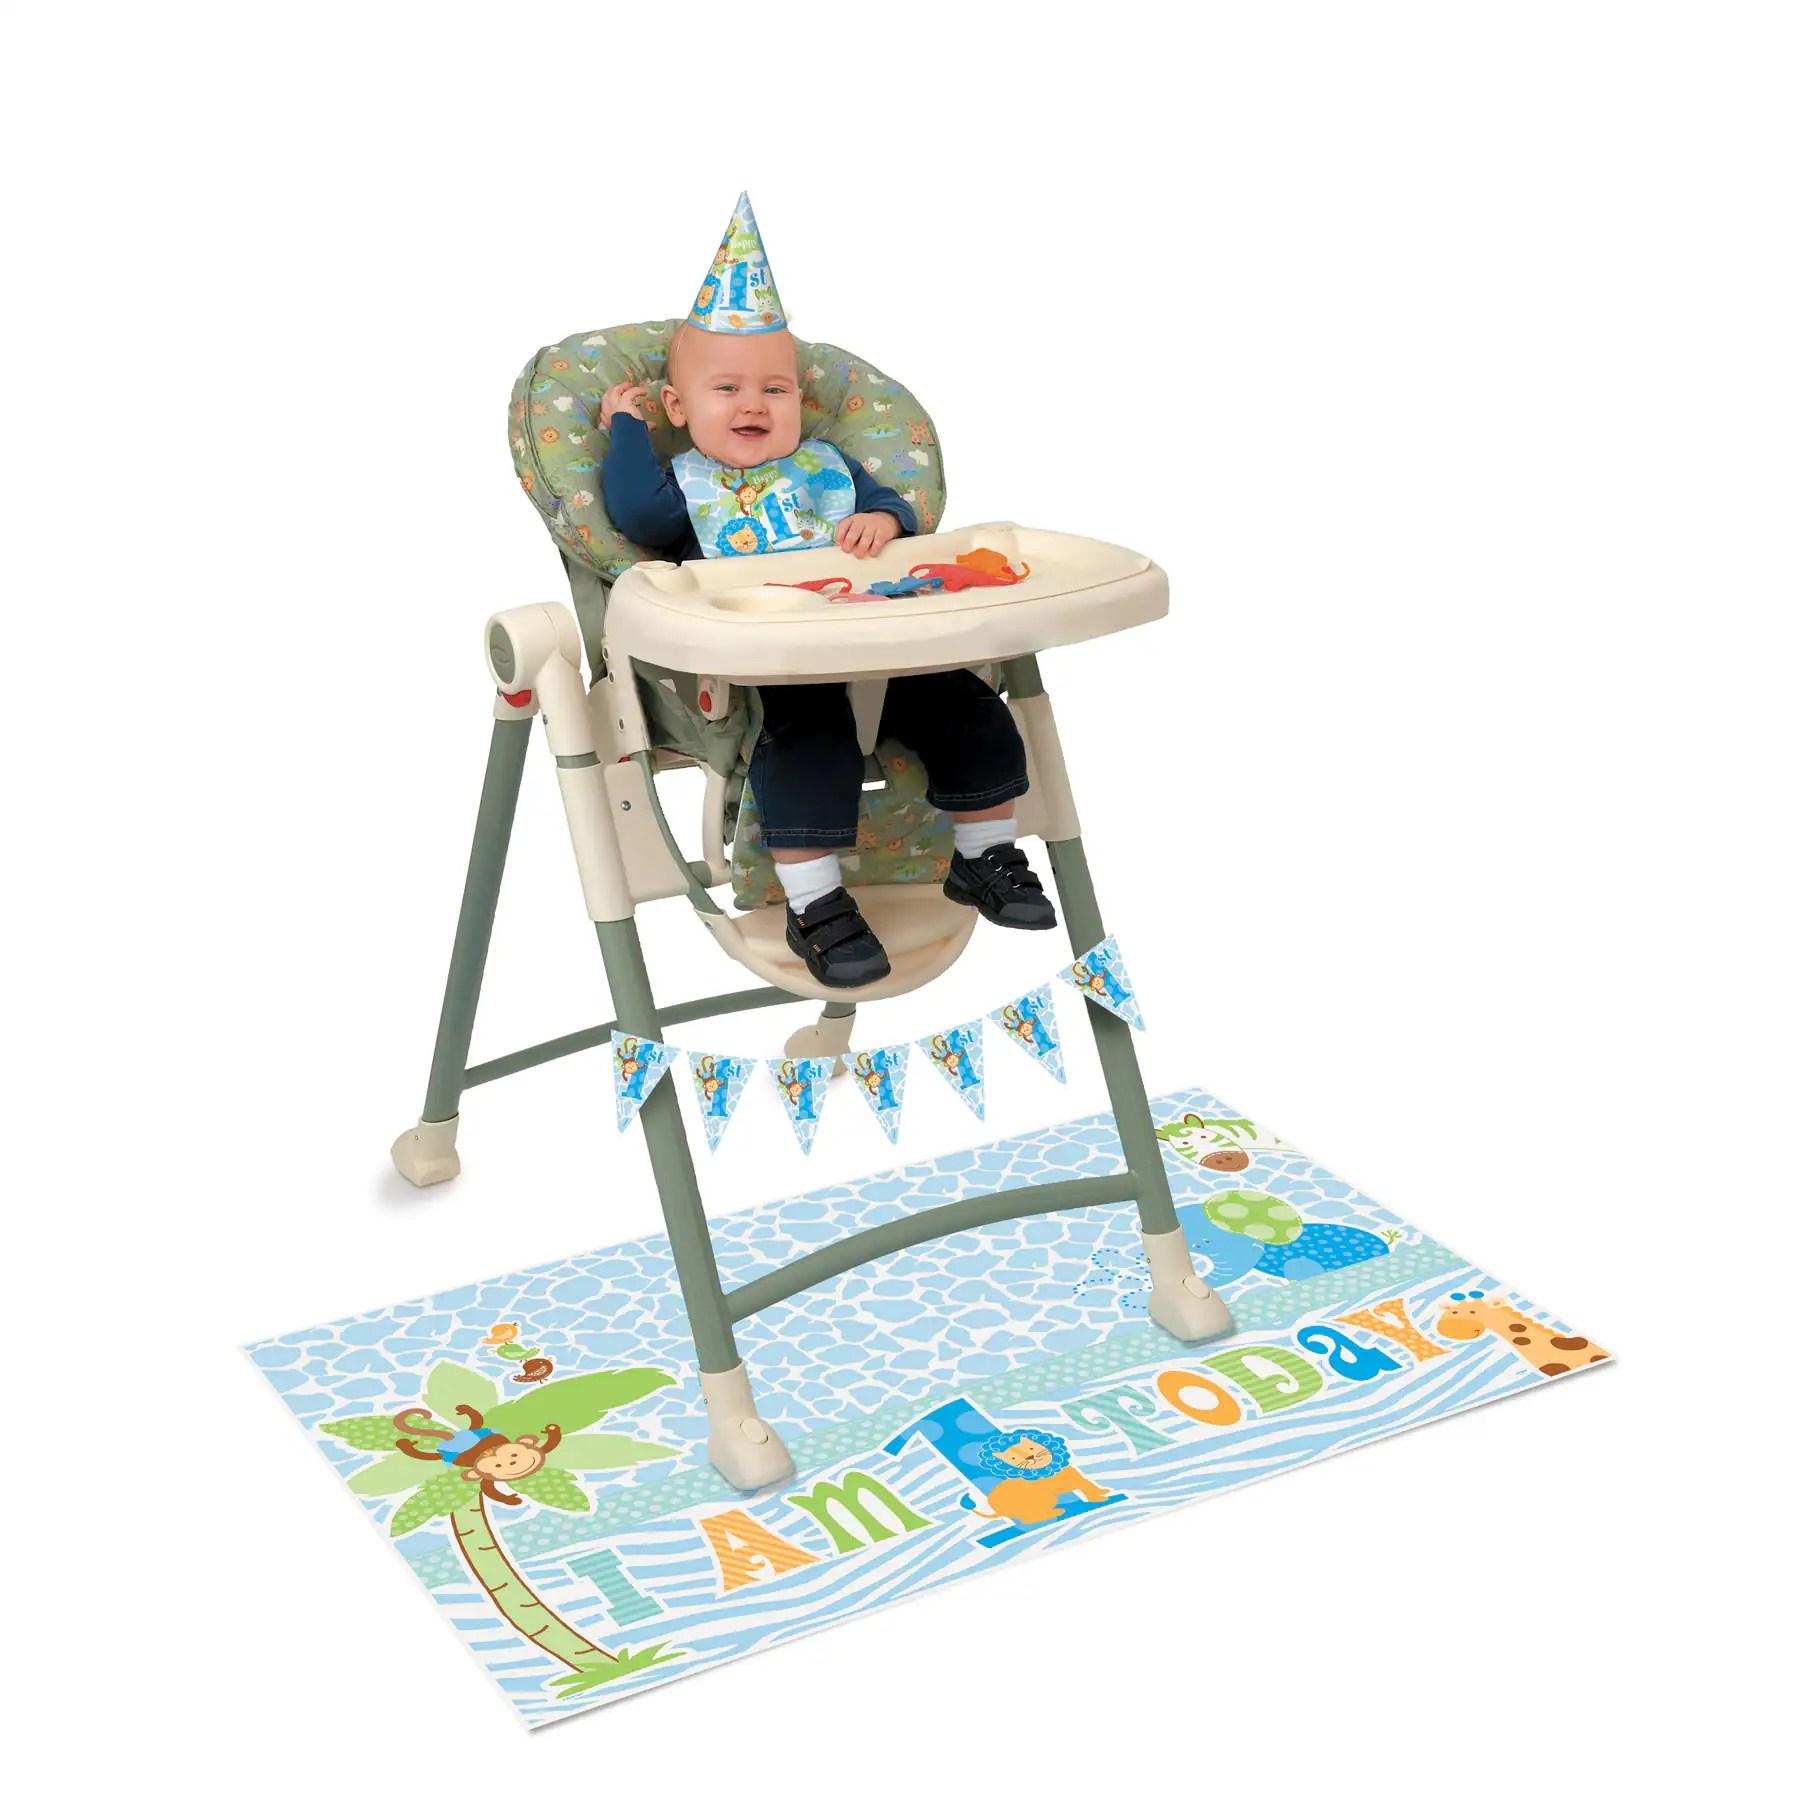 safari high chair tripod fishing blue 1st birthday decorating kit img